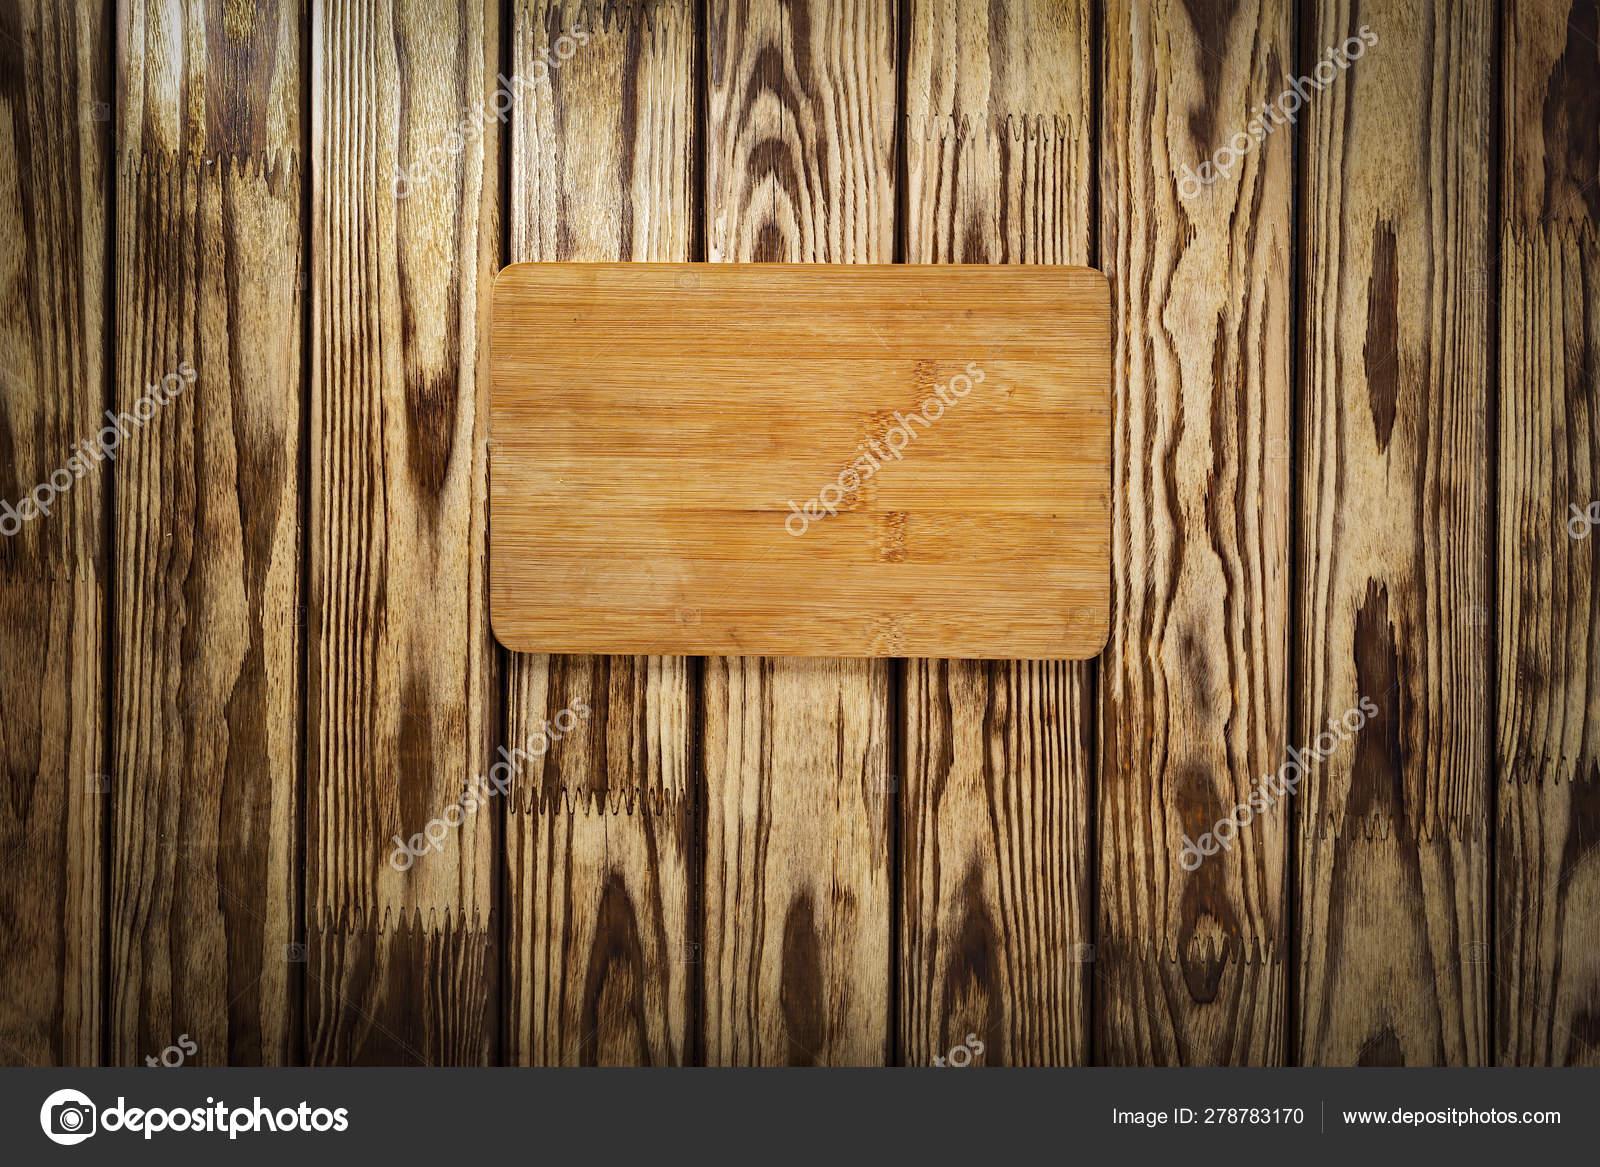 Wood Cutting Board Wood Rustic Bbq Wooden Cutting Board Woode Stock Photo C Manya Peace 45 Ex Ua 278783170